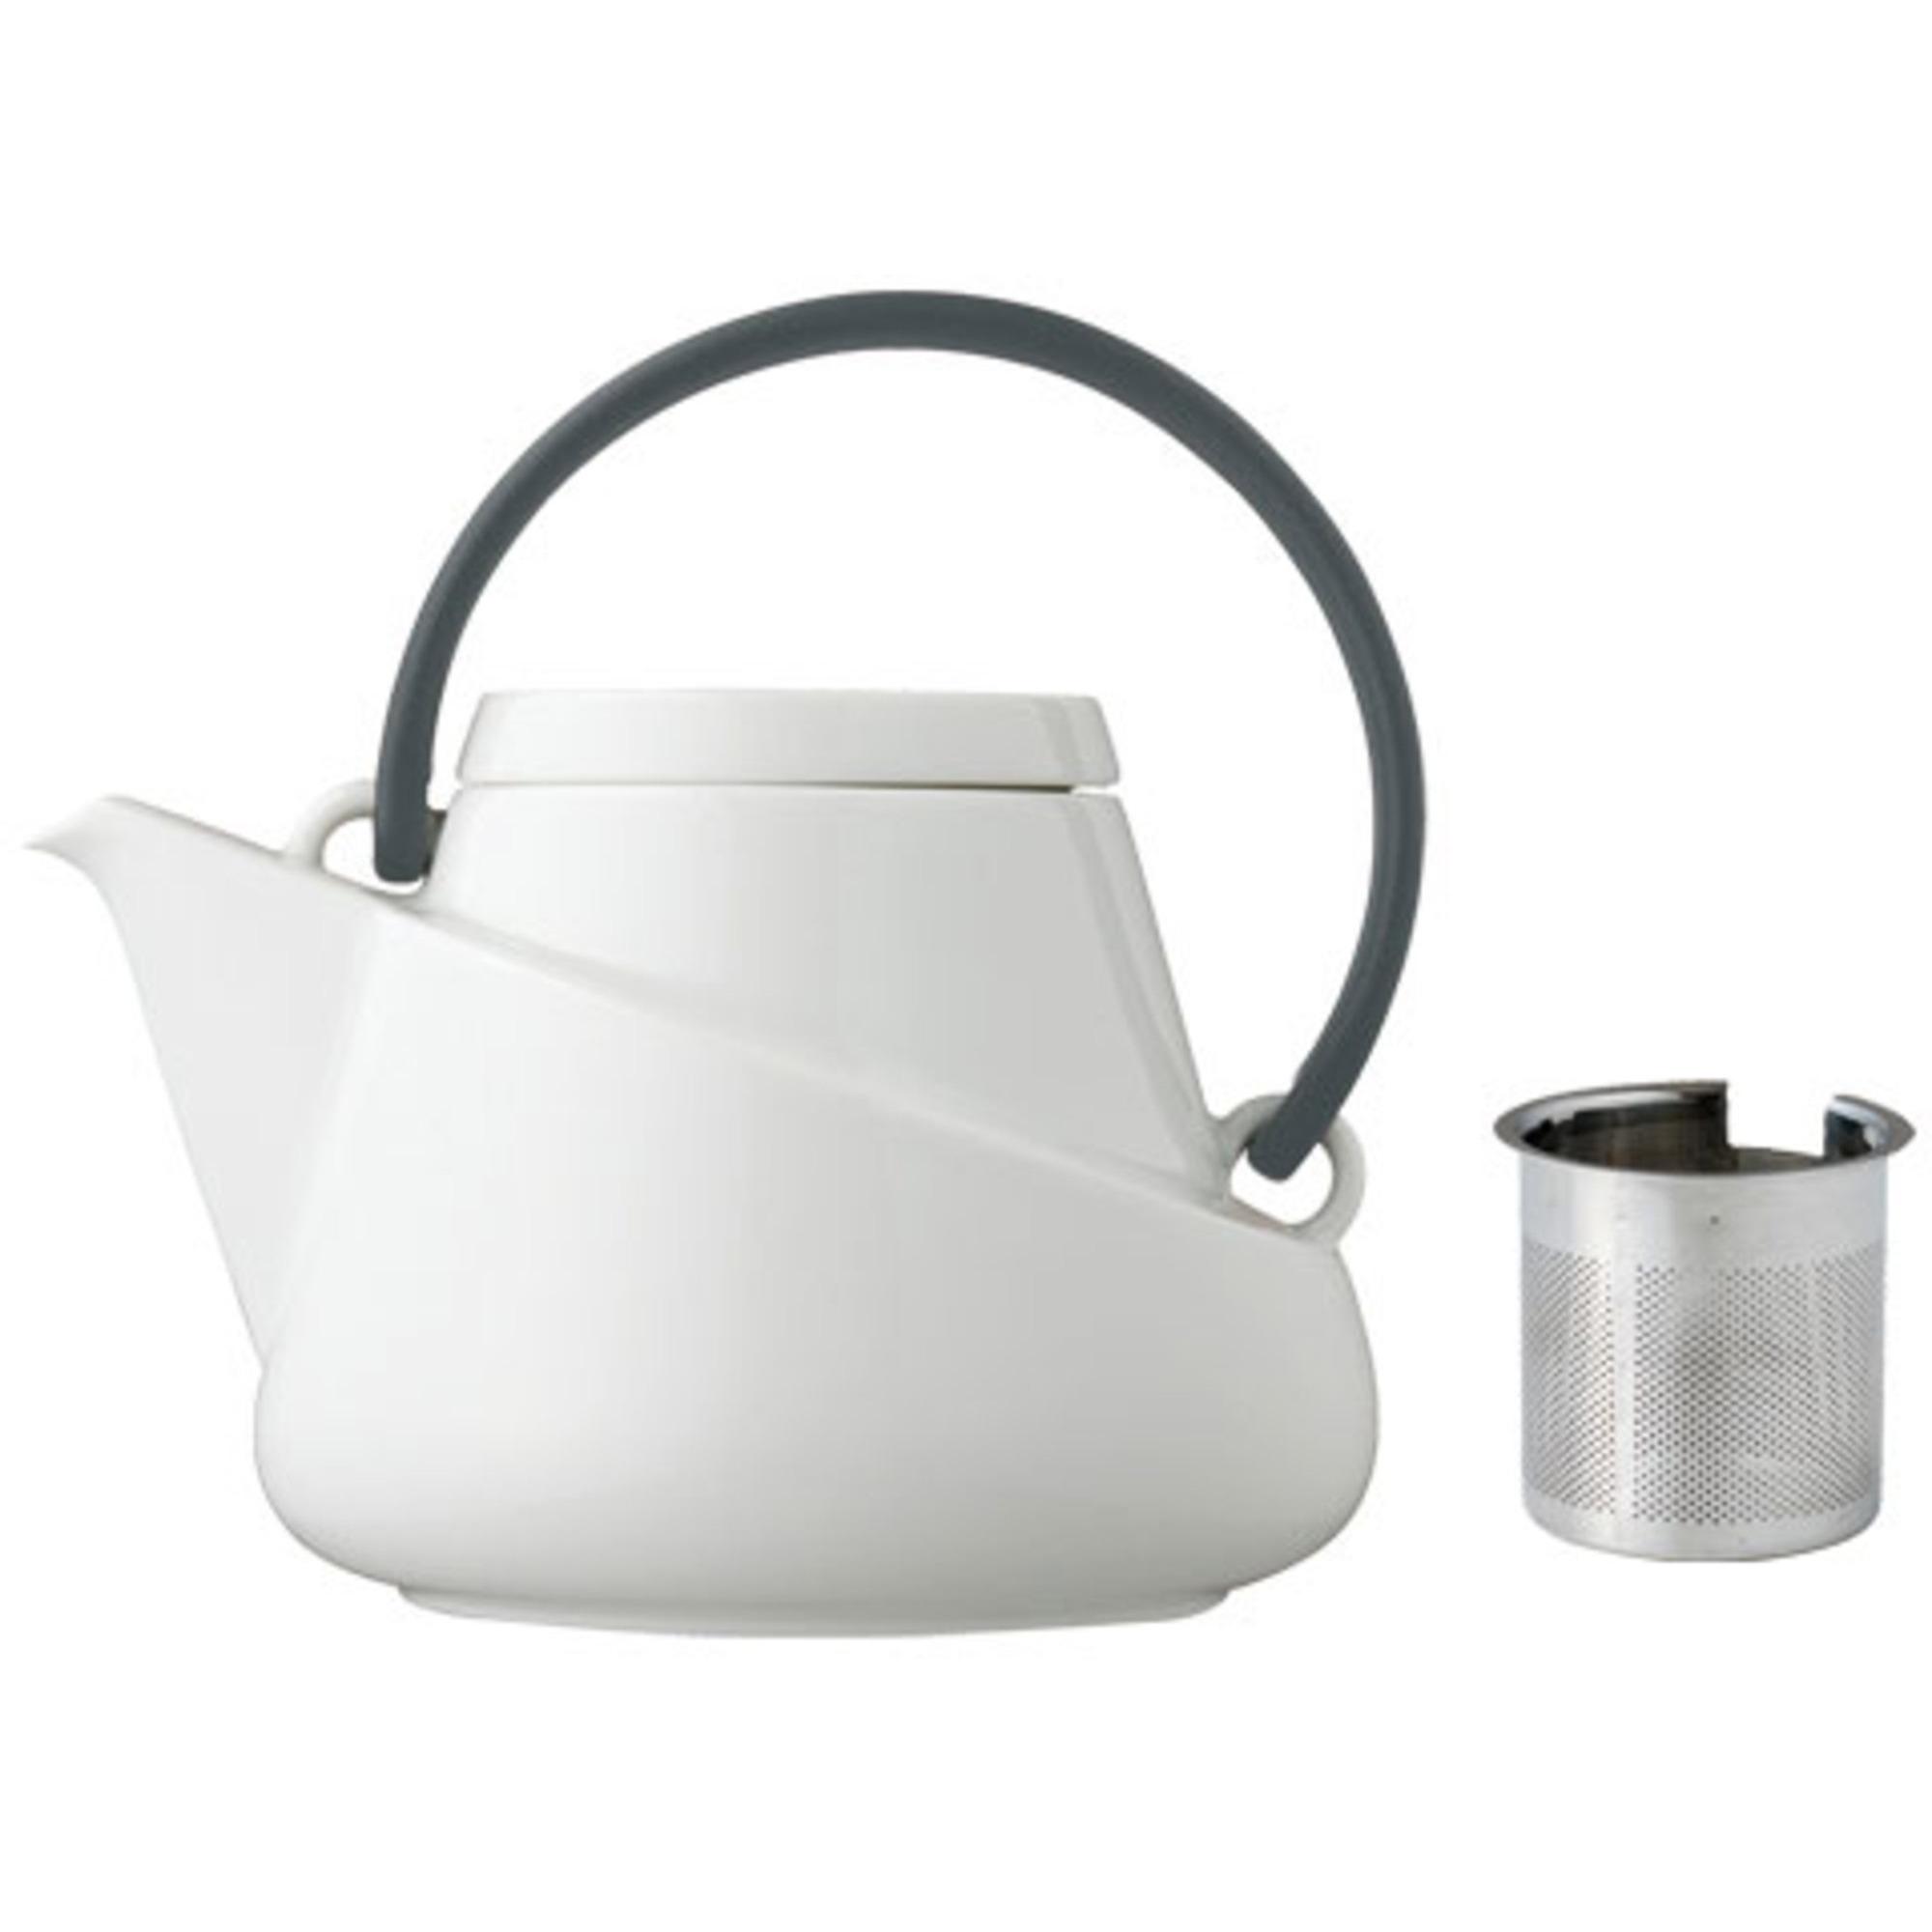 Kinto RIDGE teapot 750ml black with strainer